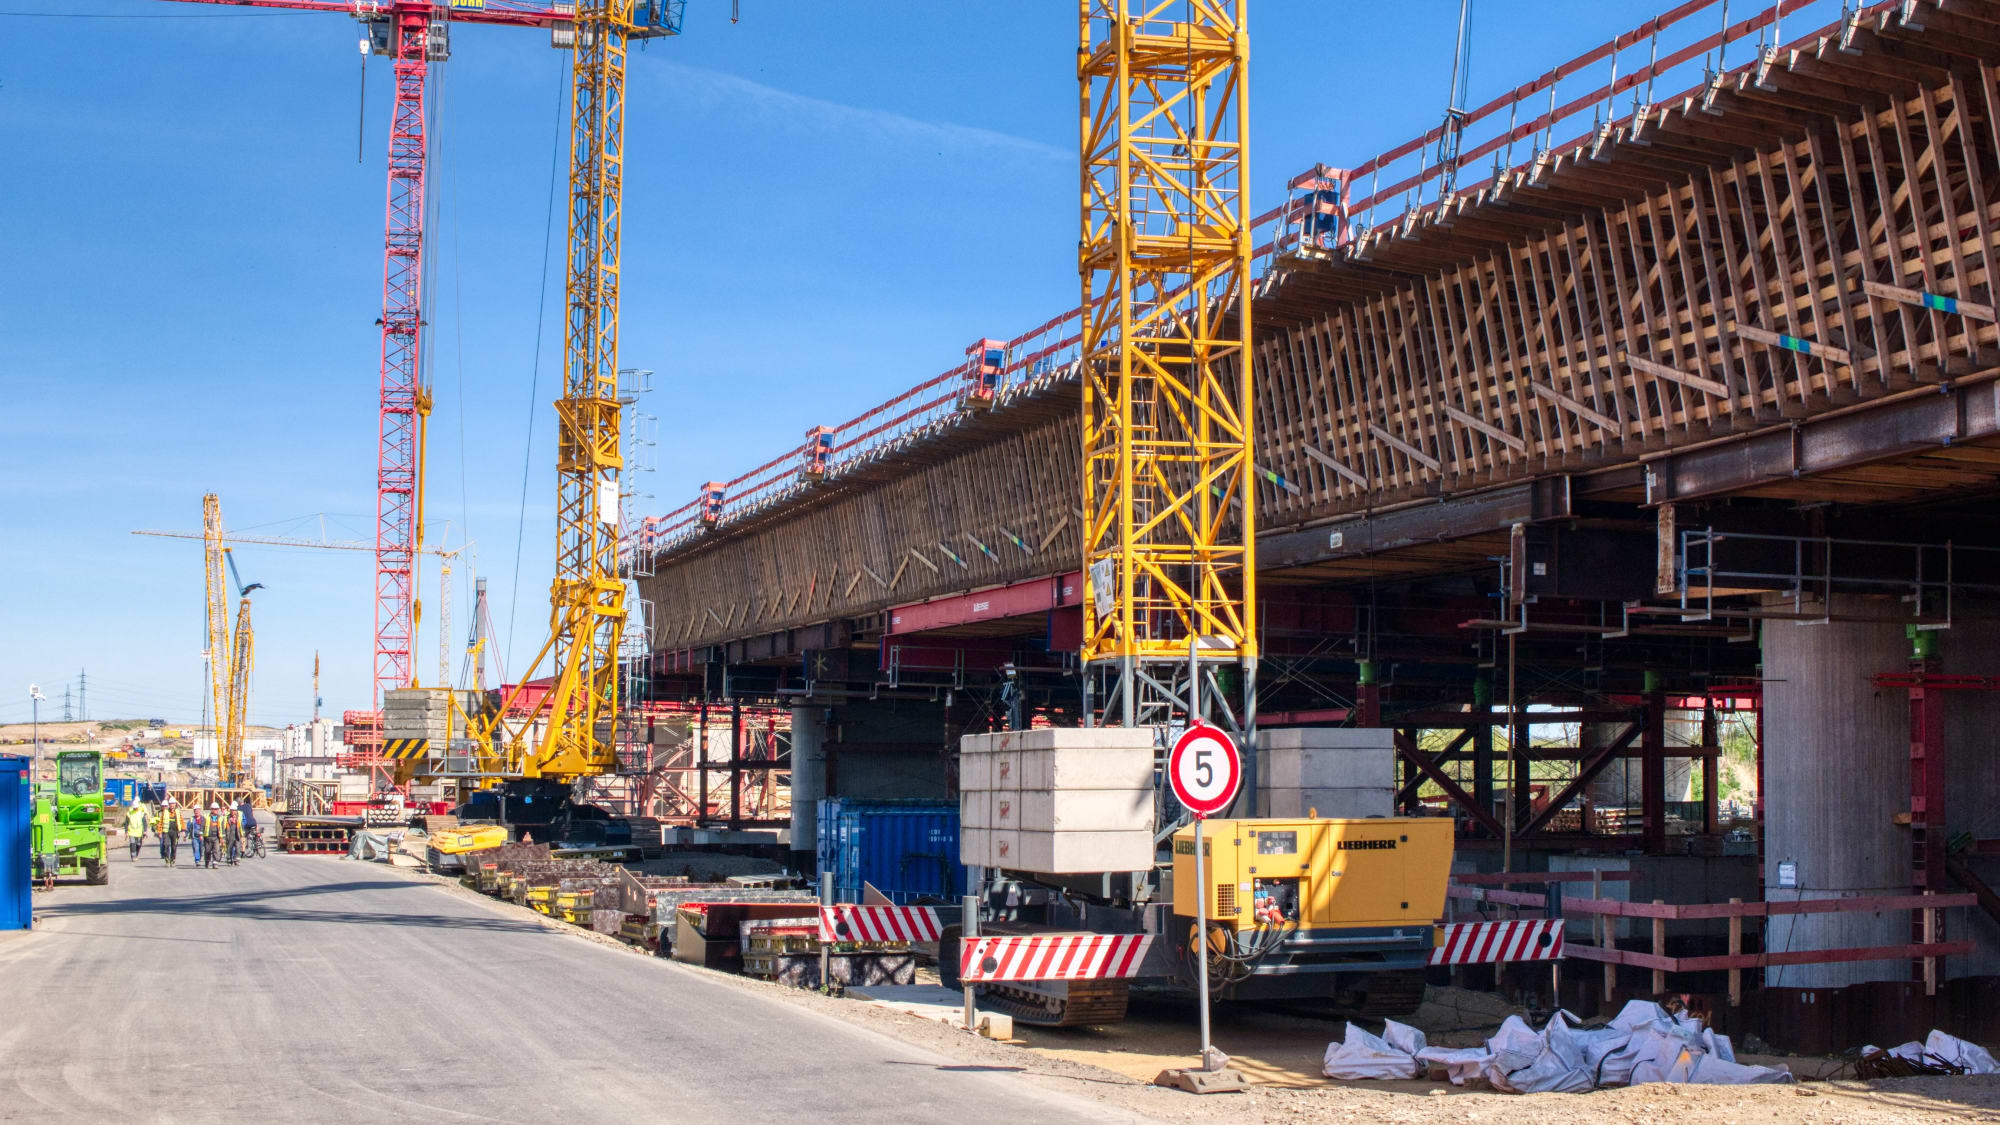 Baustelle der Leverkusener Brücke im April 2020